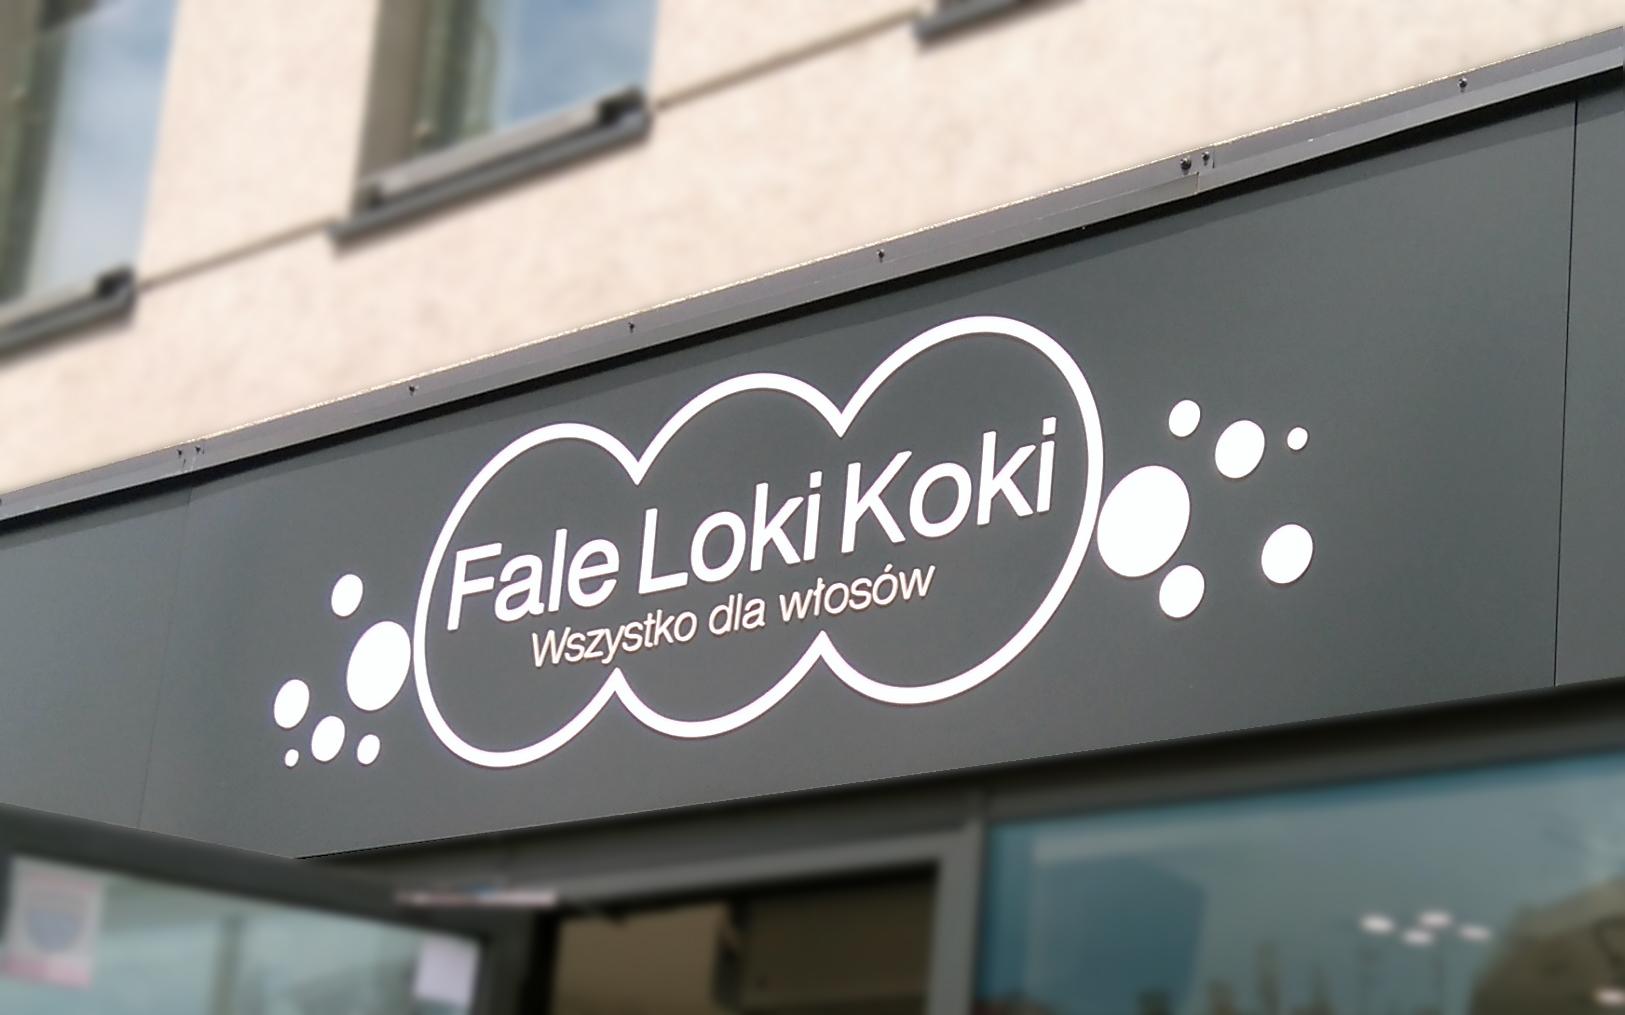 Profuturo producent reklam Fale Loki Koki